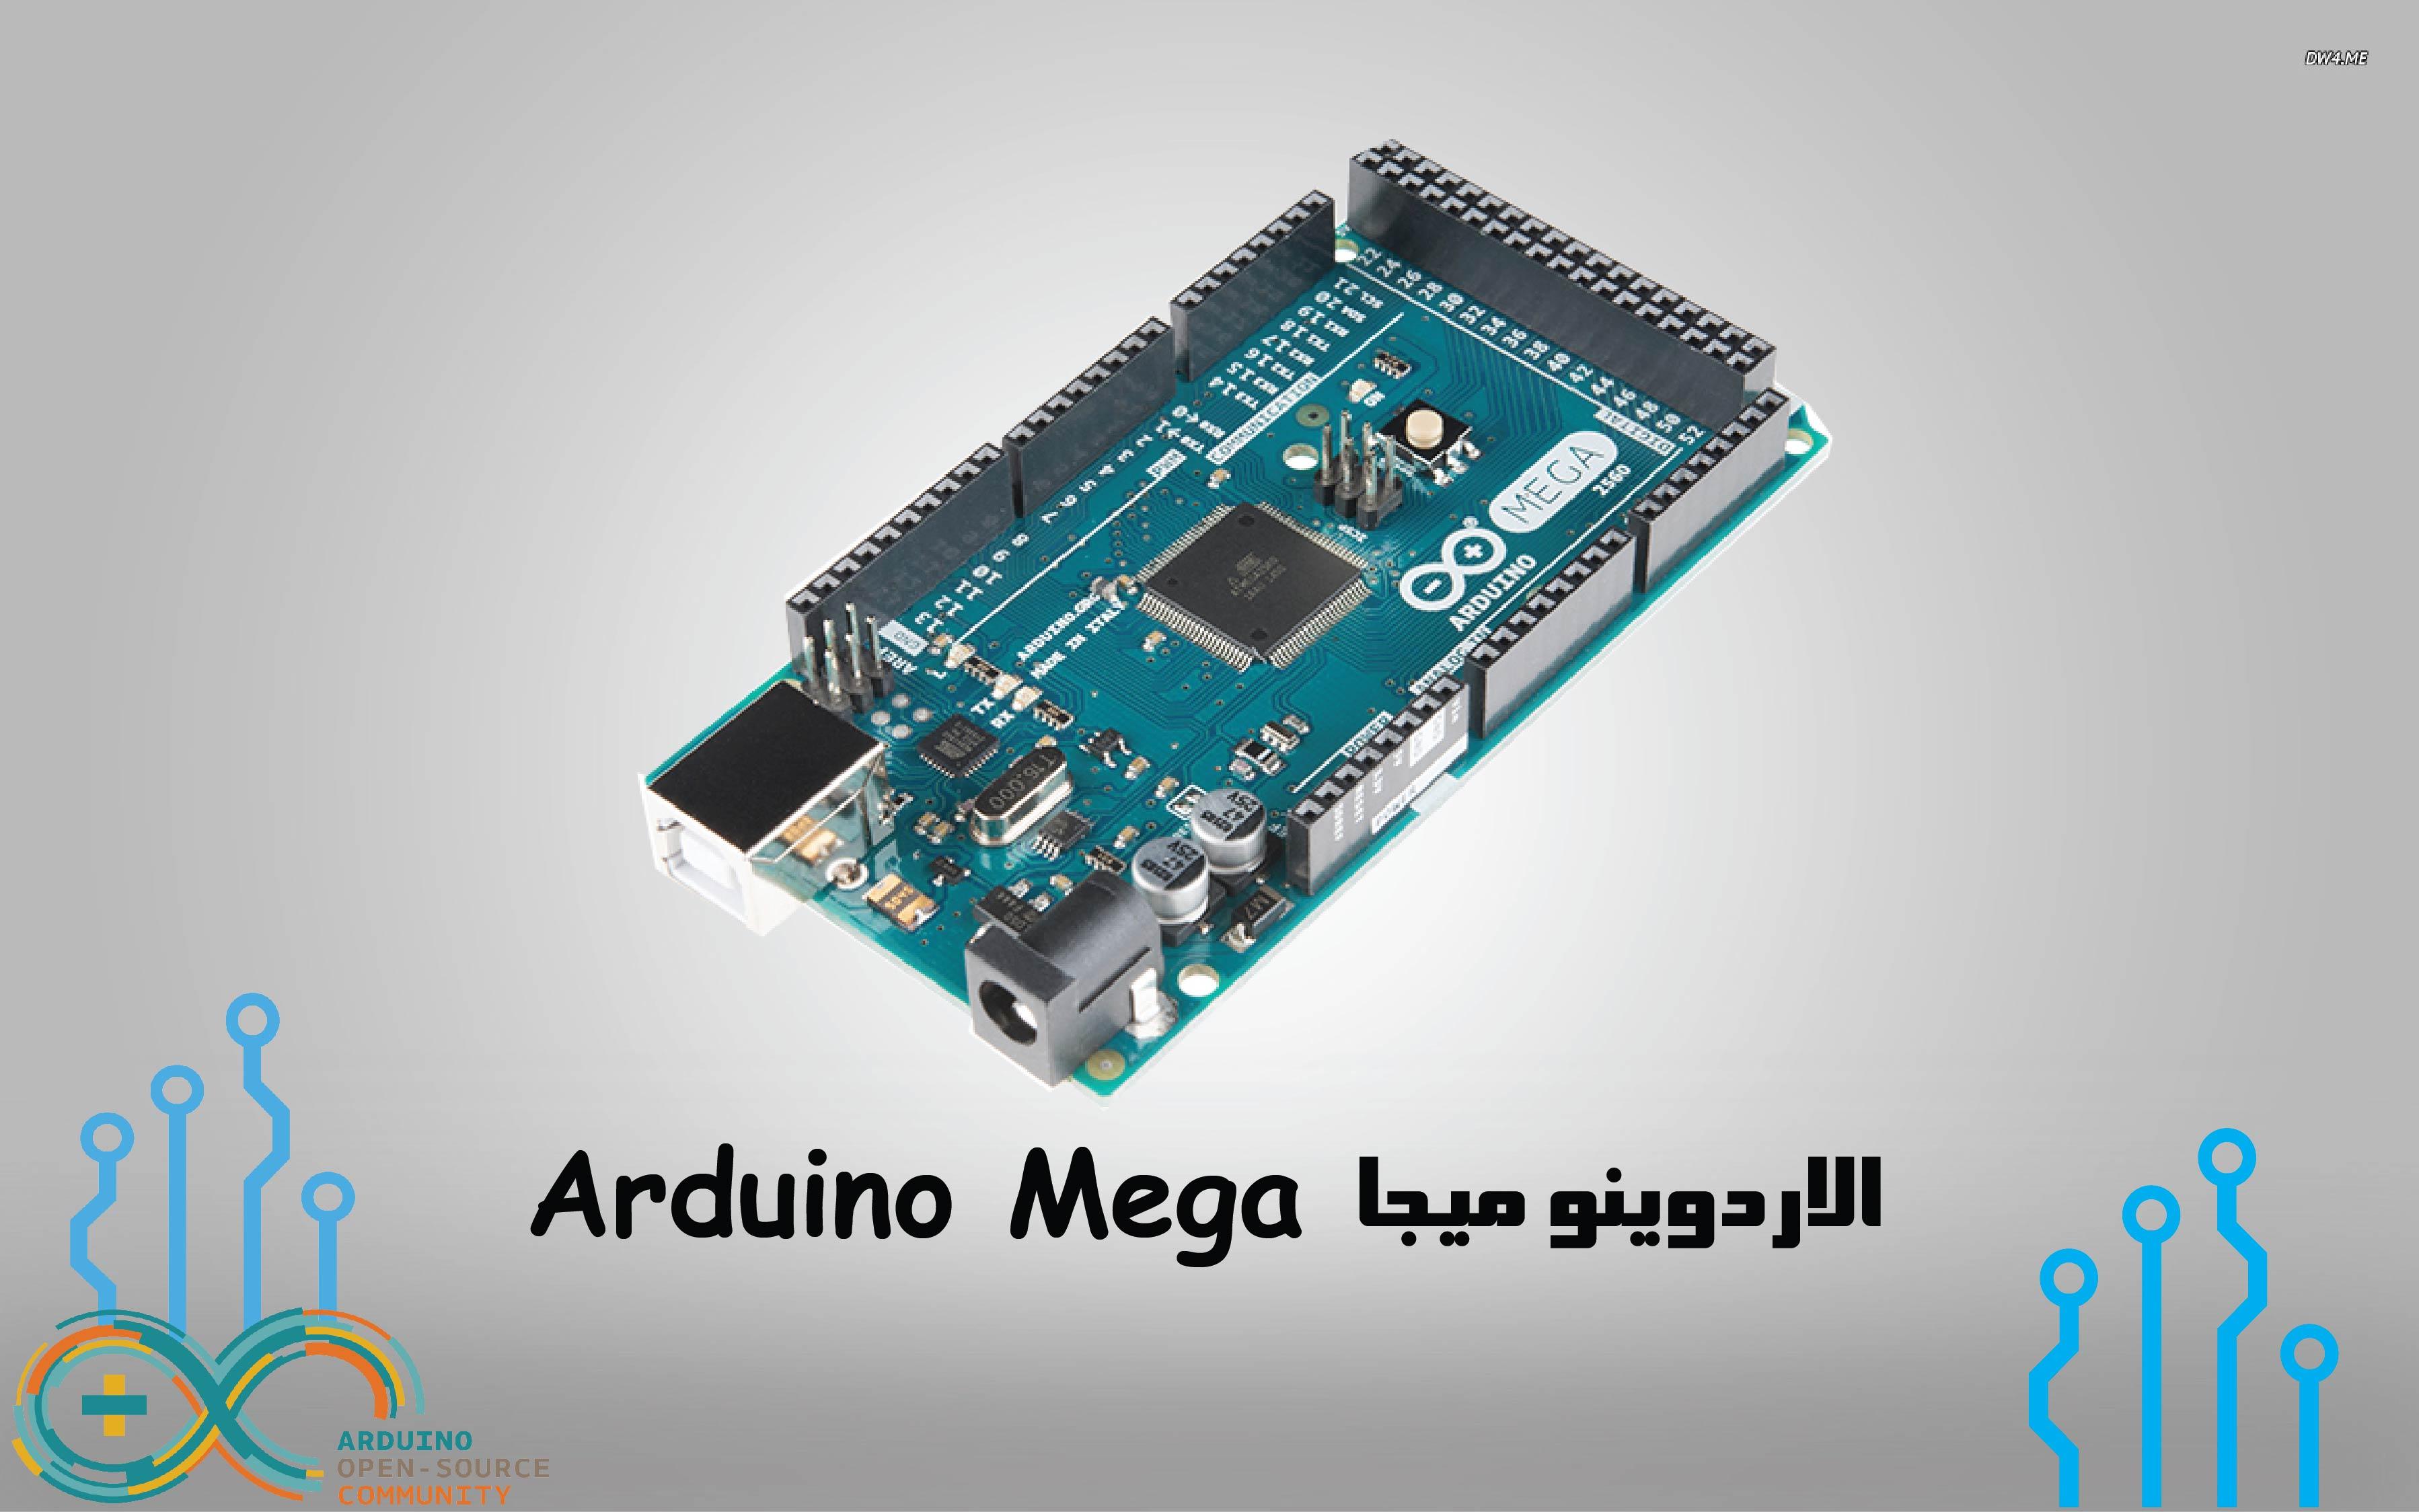 Arduino & Genuino Mega 2560 أردوينو ميجا - RoboticX